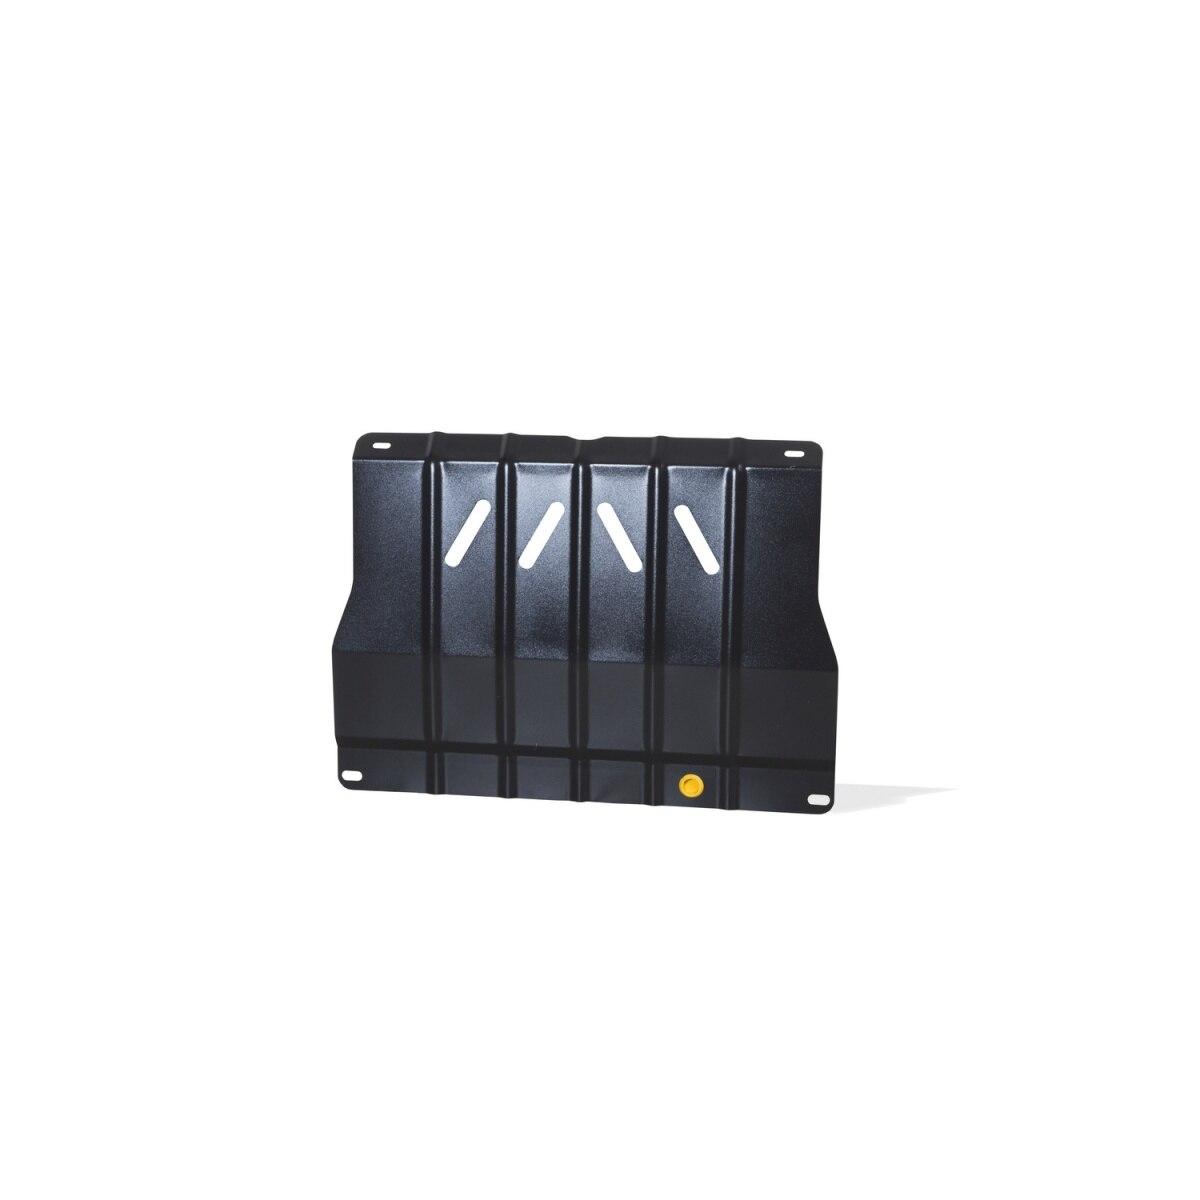 Sujetadores ZK adecuados para Daewoo Matiz (98-16) 0,8/1,0/contenedor. Mt/a (MAT)